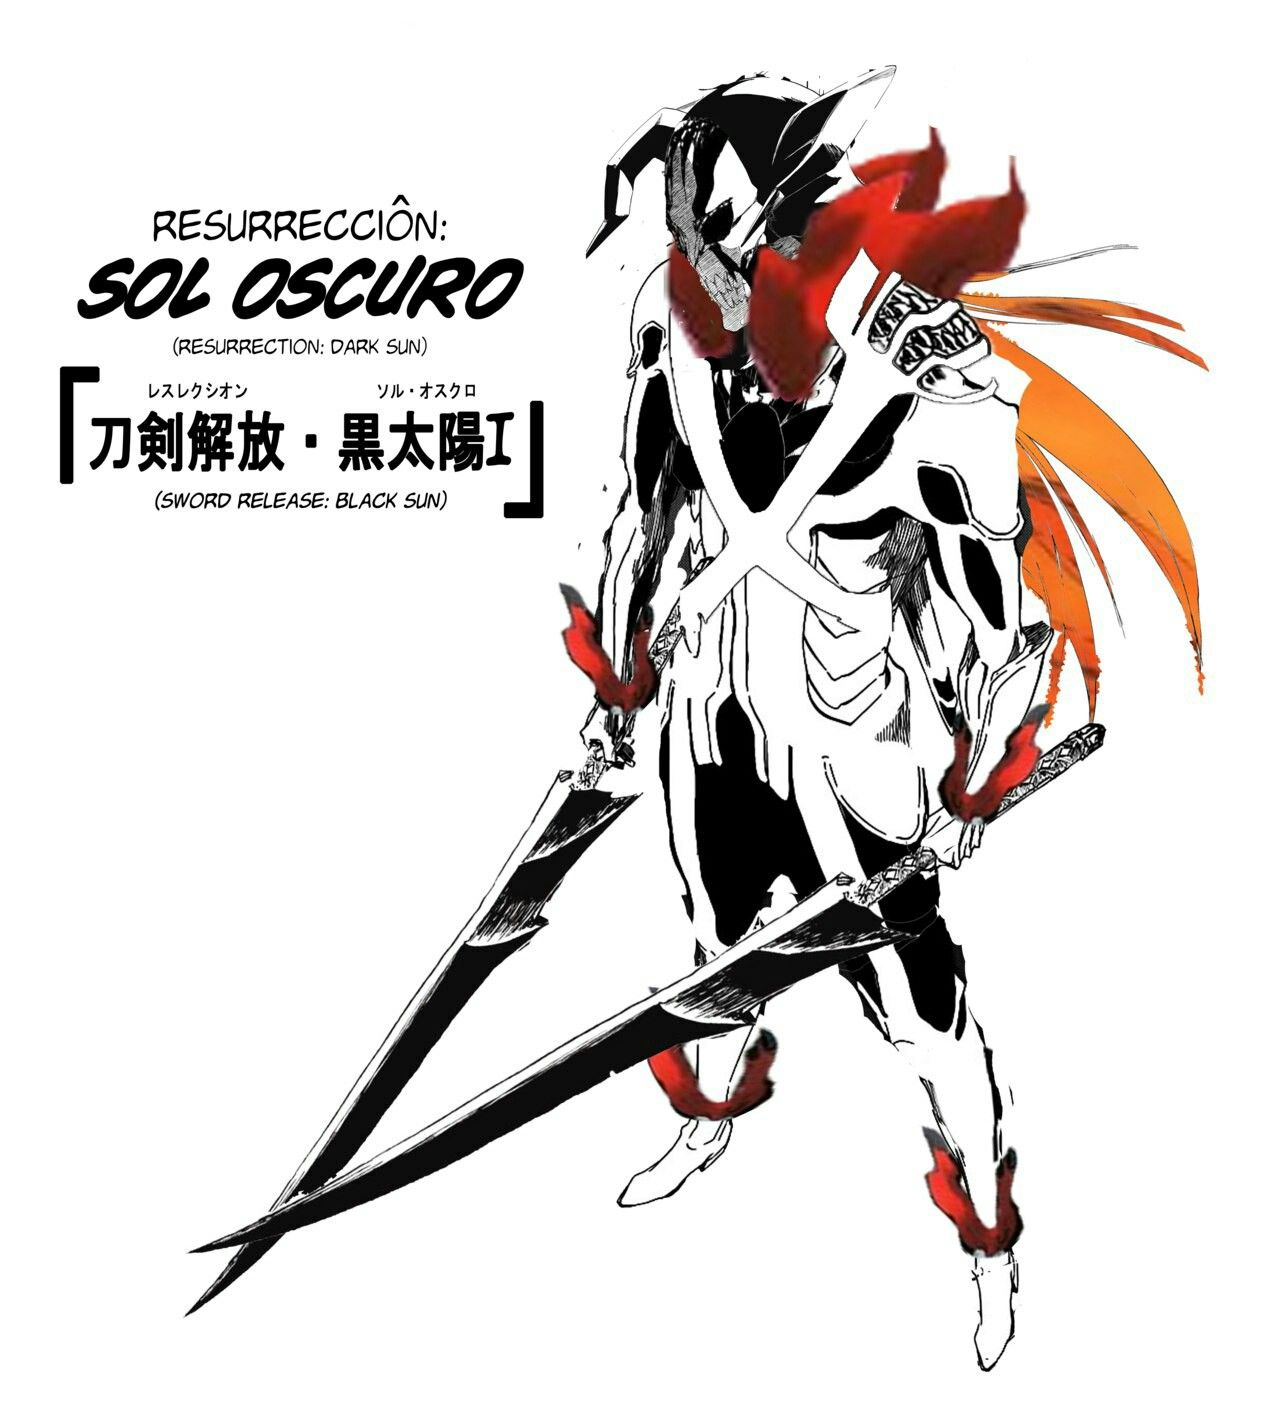 Fullbring Form Bleach And Concept Art T Bleach Manga